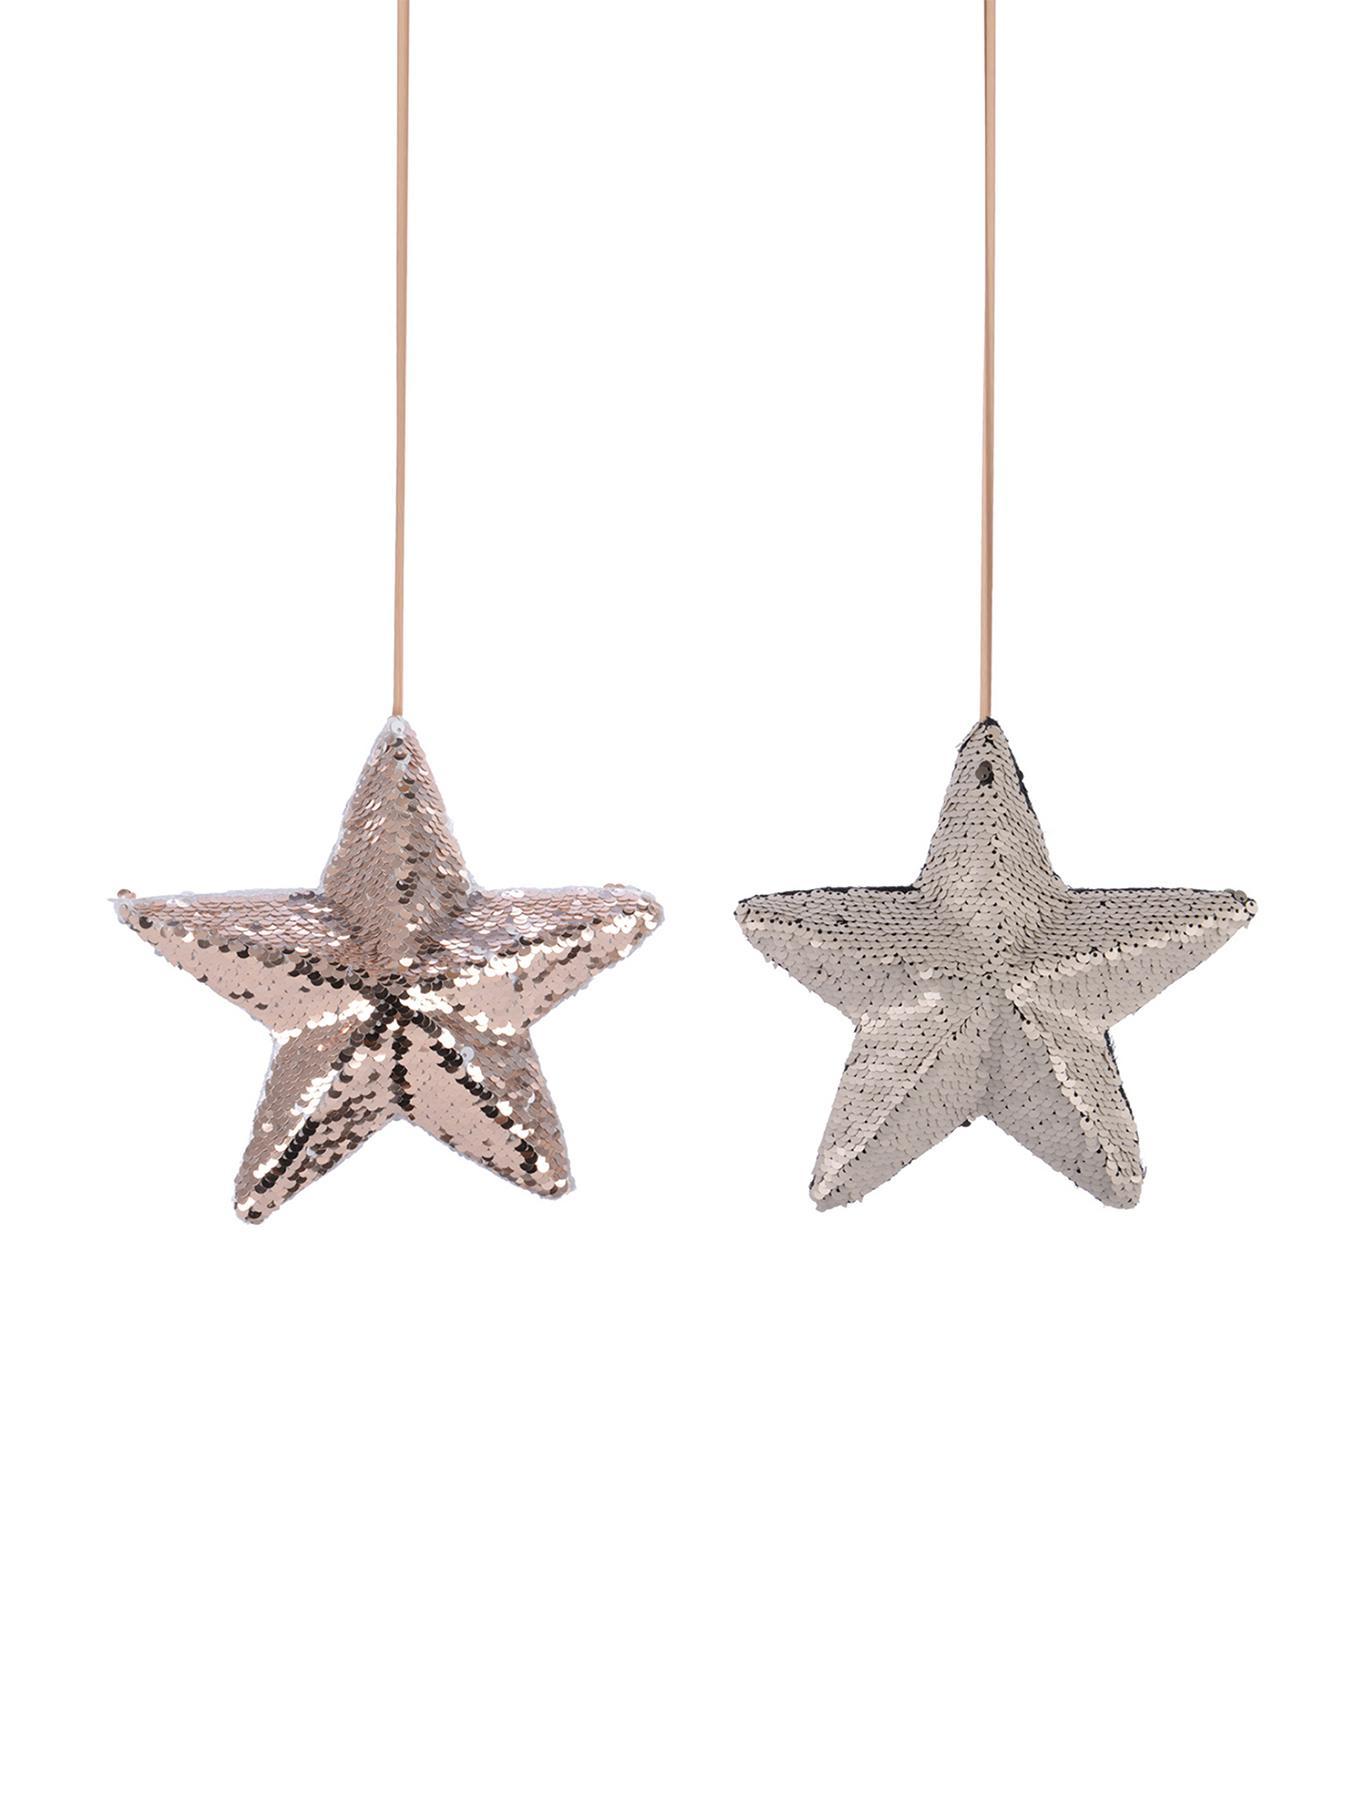 Set de adornos navideños Perky, 2pzas., Rosa, blanco, Ø 20 x F 5 cm